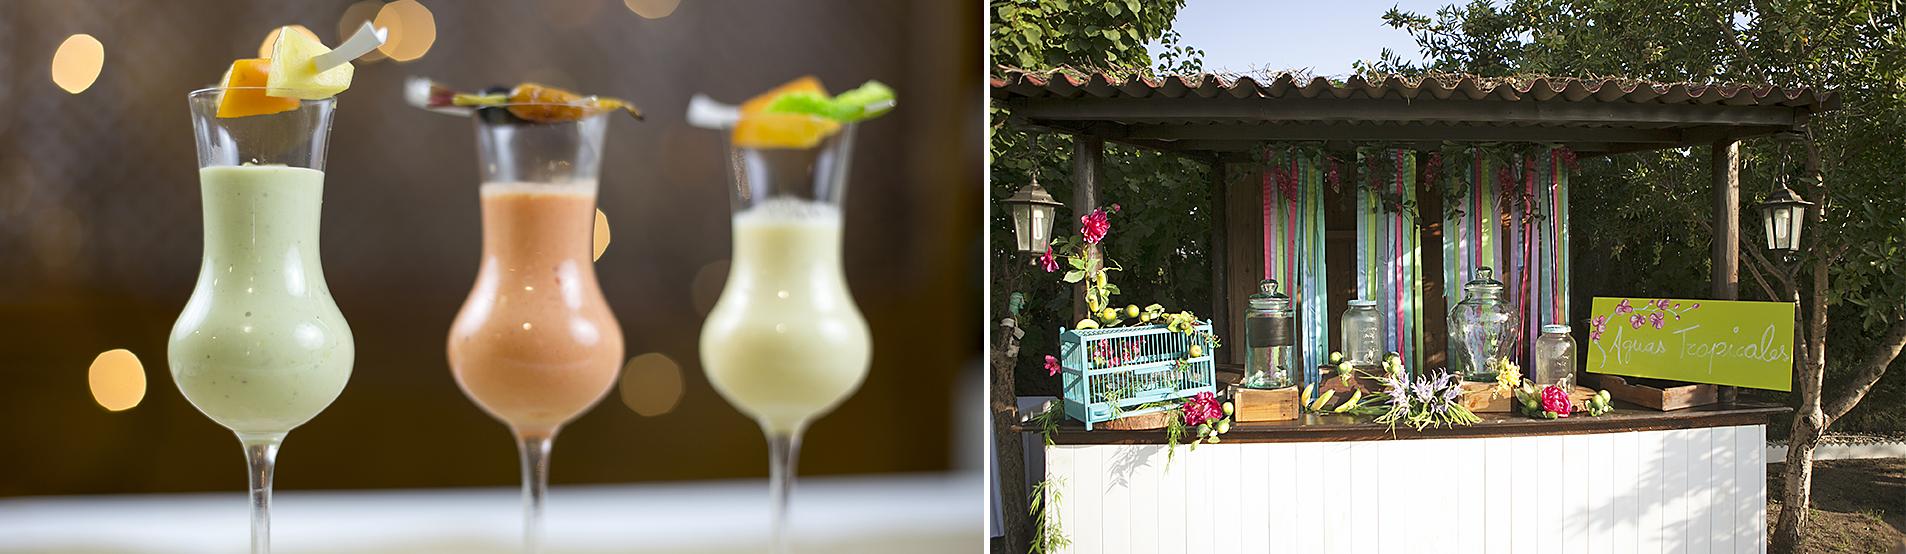 bebidas tropicale sesencia